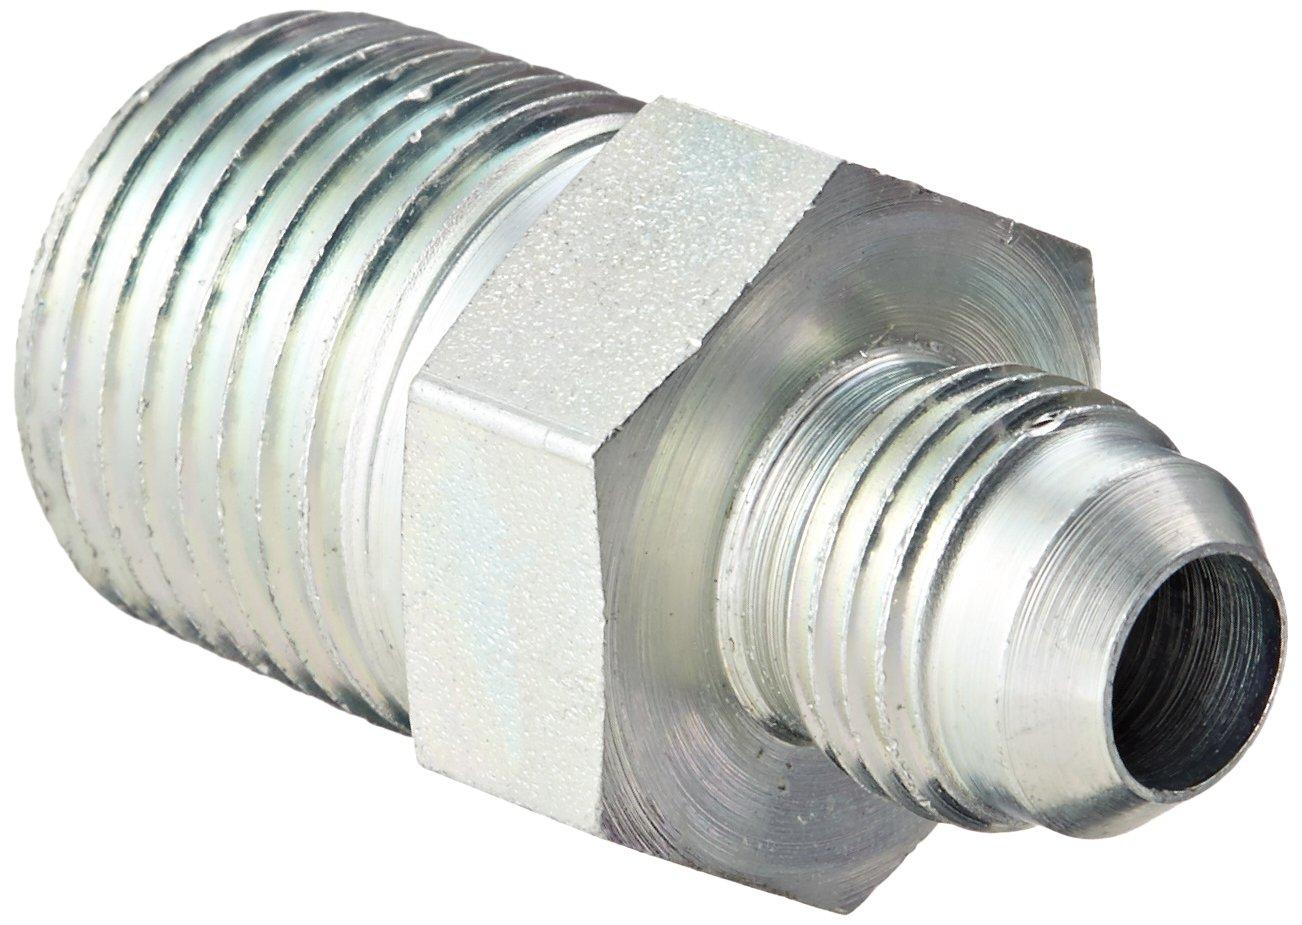 Eaton Weatherhead C5205X6X8 Carbon Steel SAE 37 Degree (JIC) Flare-Twin Fitting, Adapter, 1/2'' NPT Male x 3/8'' JIC Male (Pack of 10)